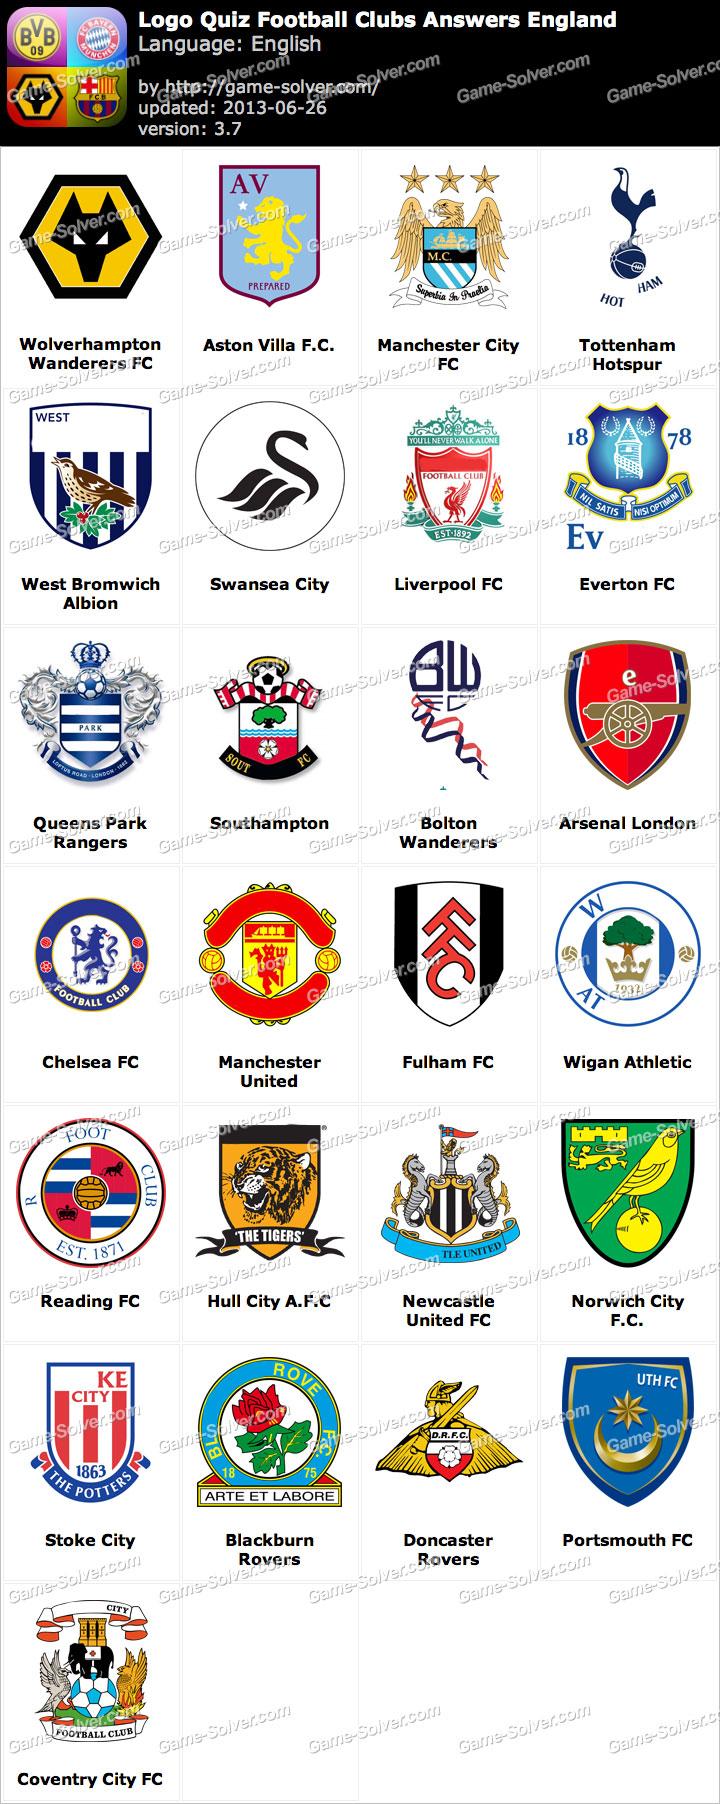 Logo Quiz Football Clubs Answers England